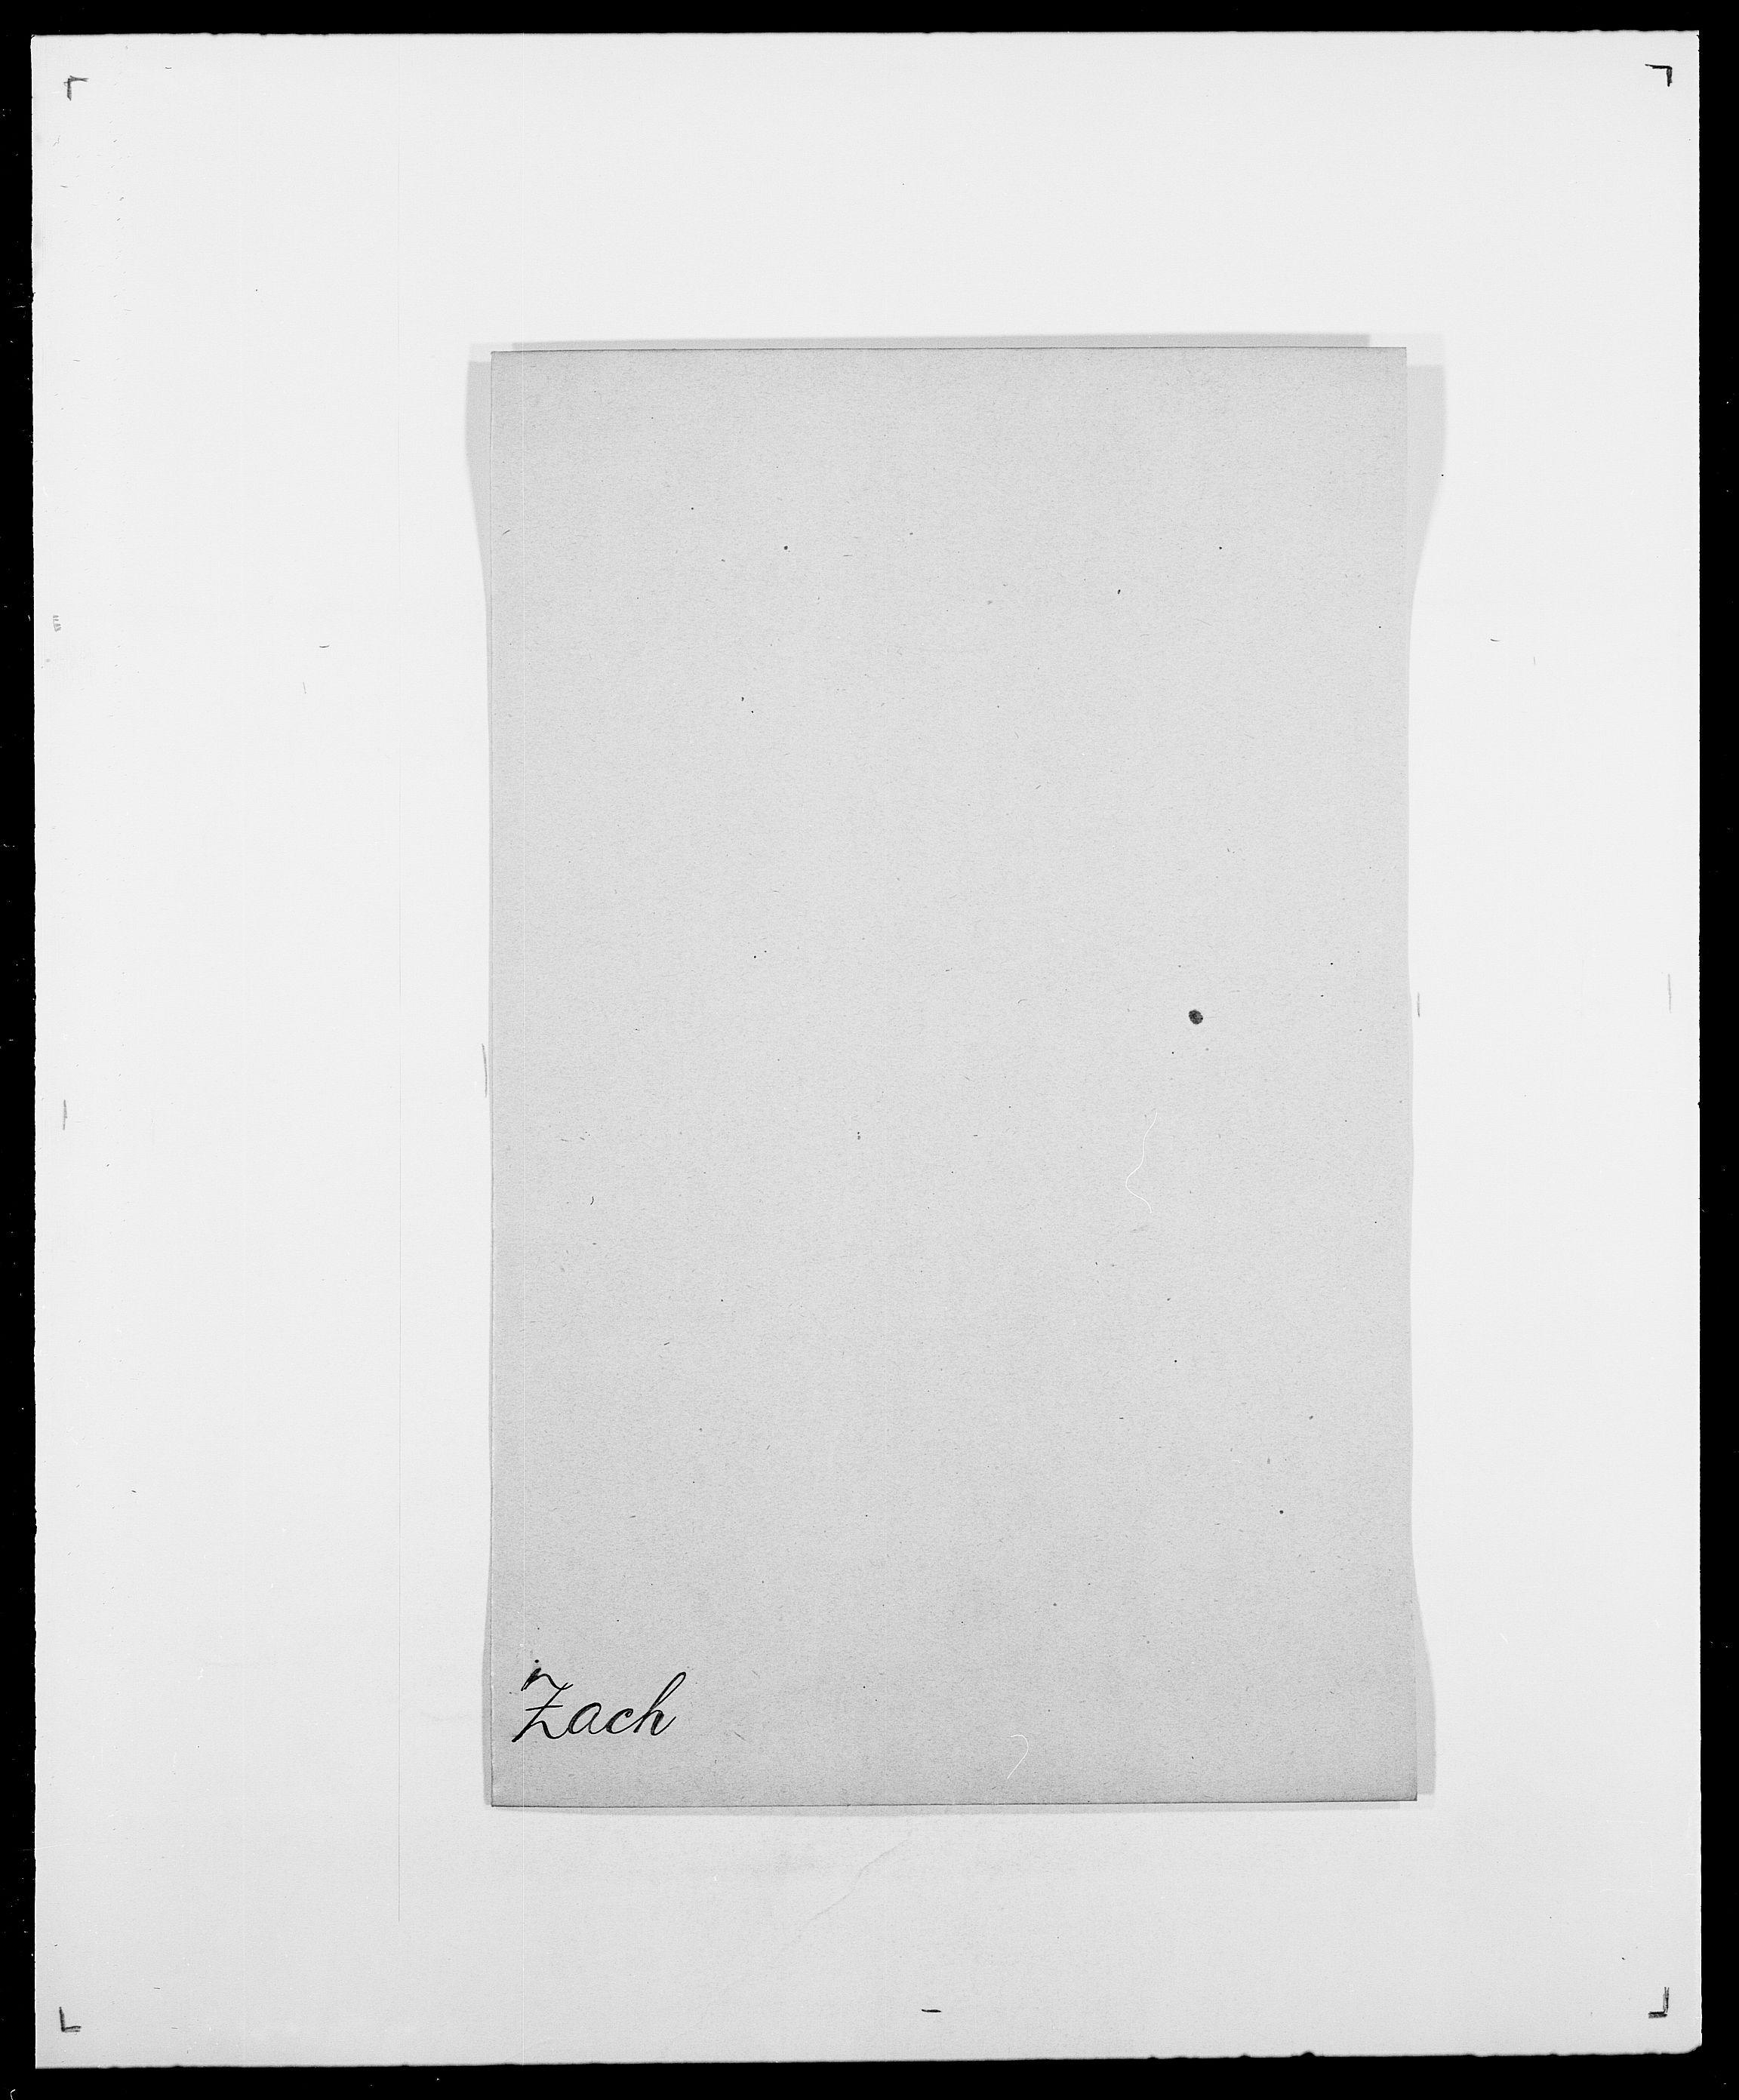 SAO, Delgobe, Charles Antoine - samling, D/Da/L0043: Wulfsberg - v. Zanten, s. 55